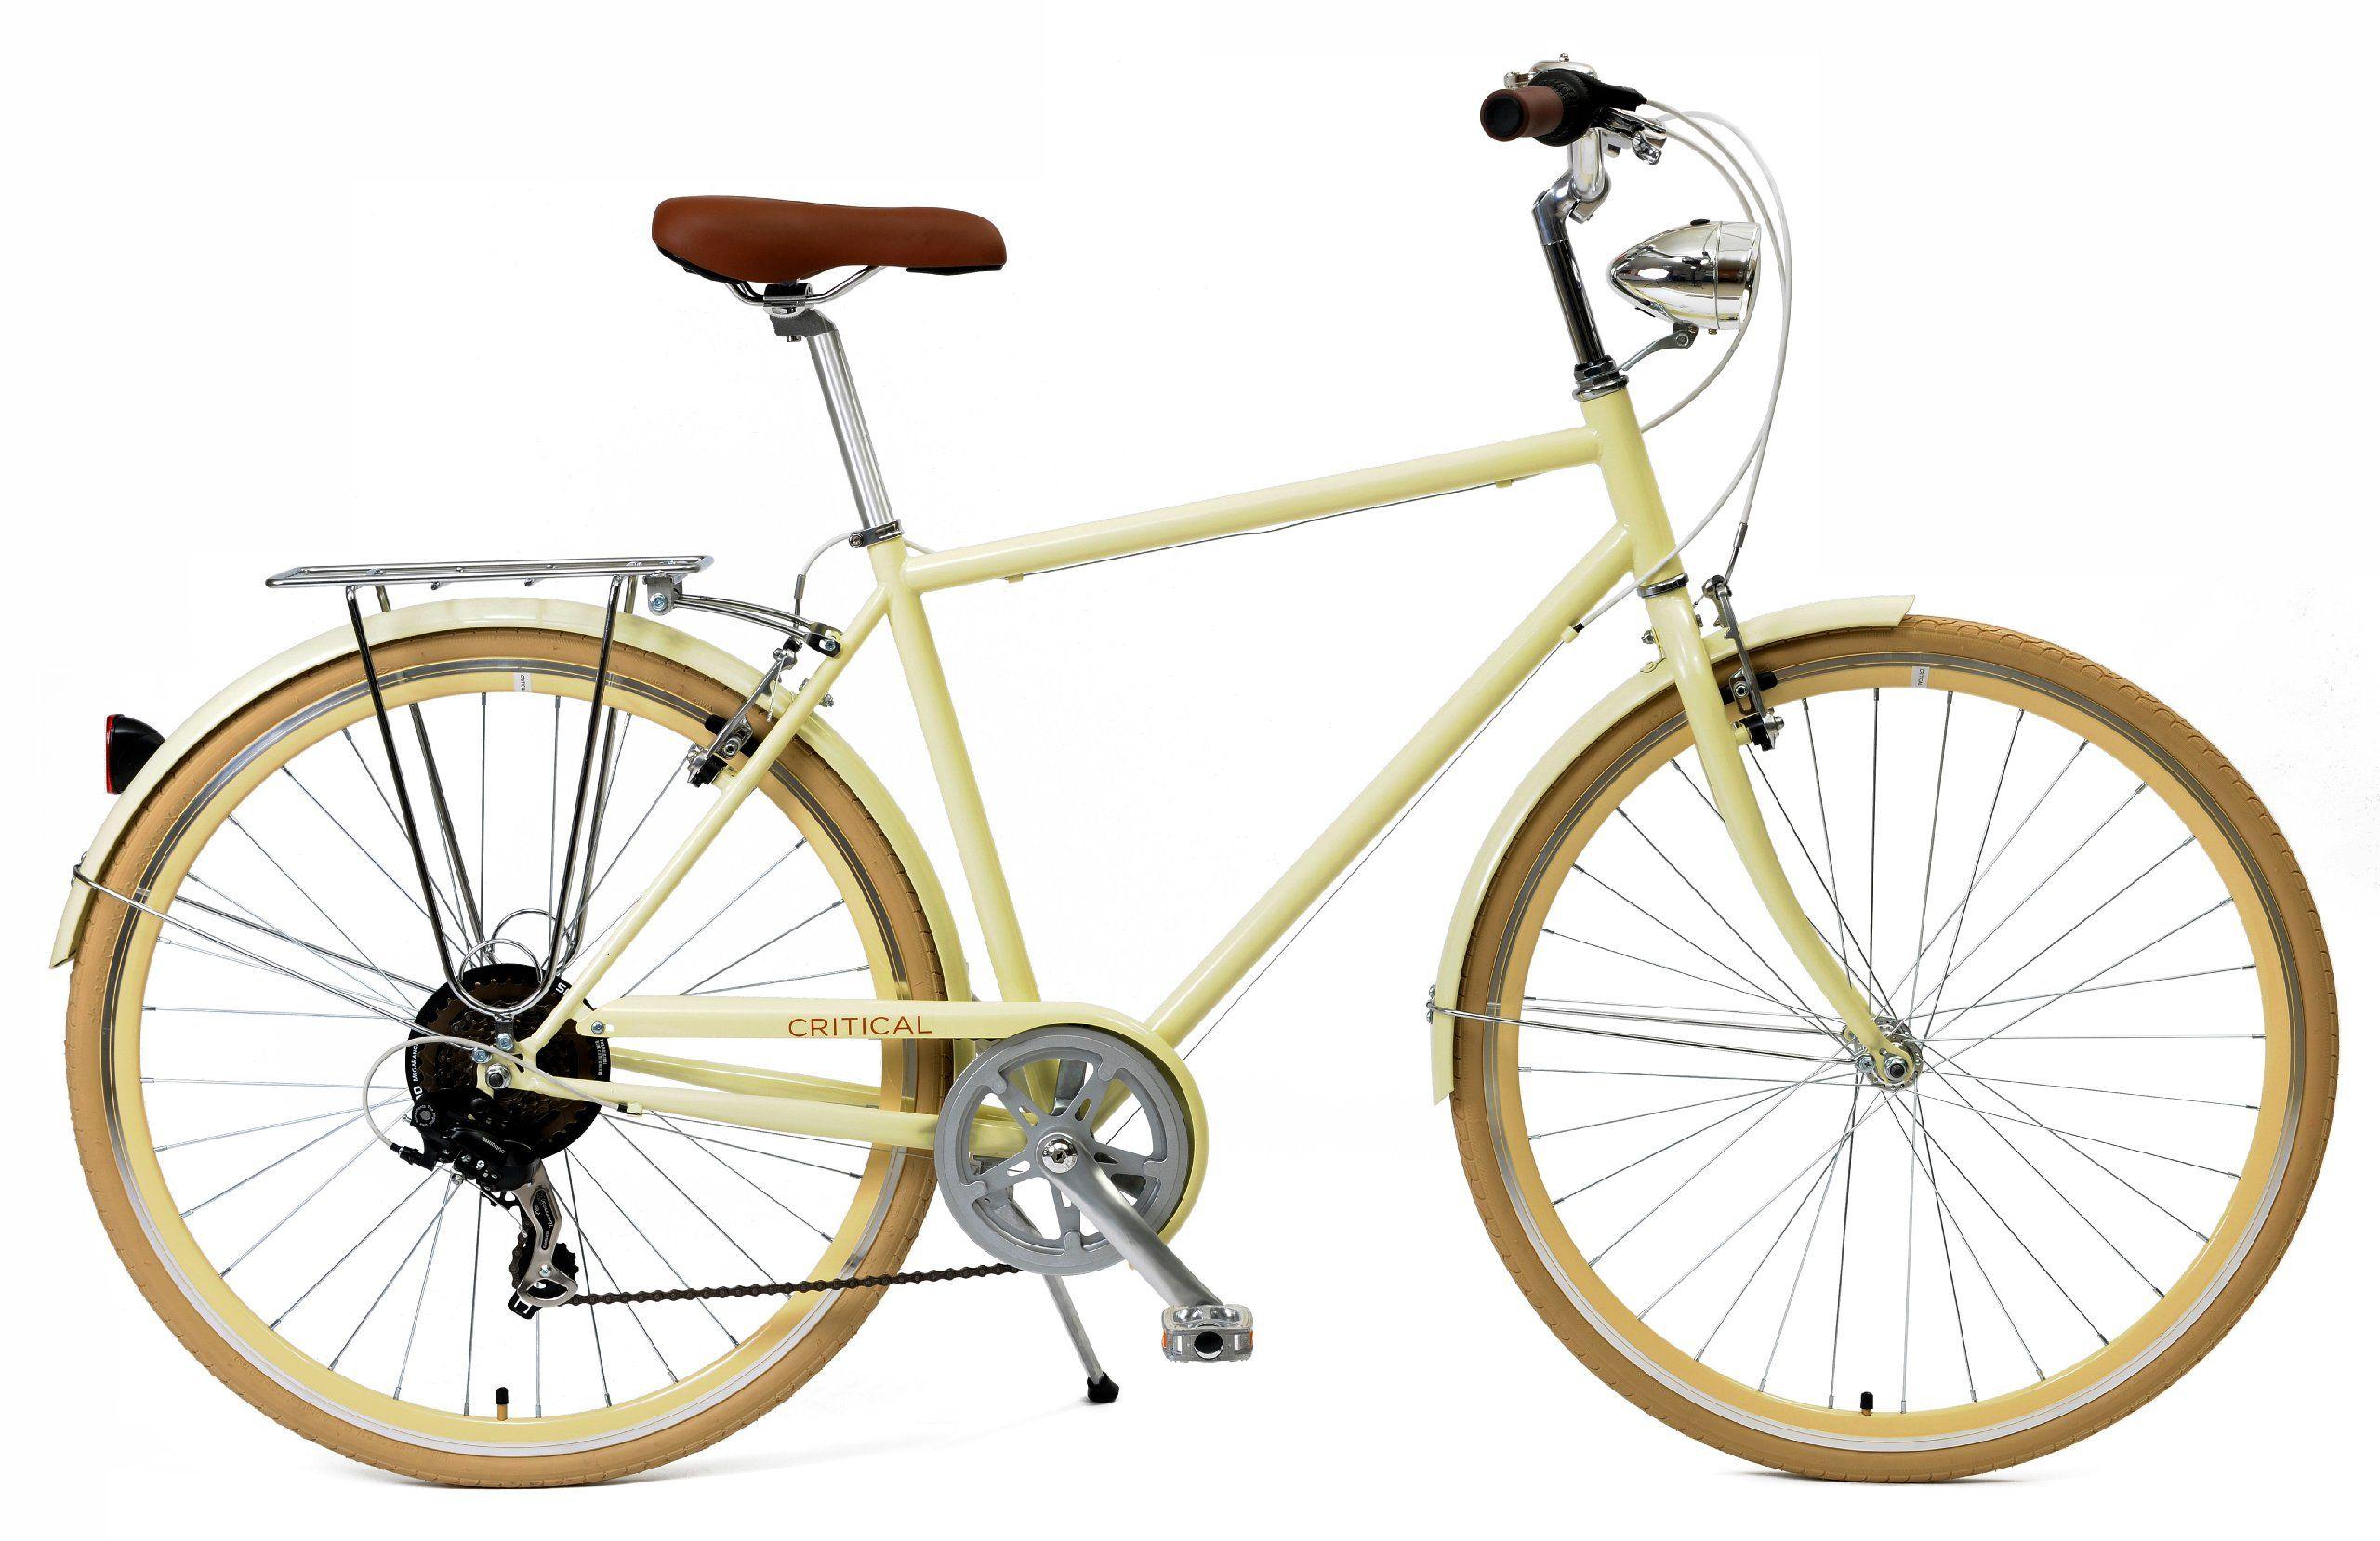 Critical Cycles Diamond Frame 7 Speed Shimano Hybrid Urban Commuter Road Bicycle Cream Small 50cm Bicycle Speed Bike Urban Bike